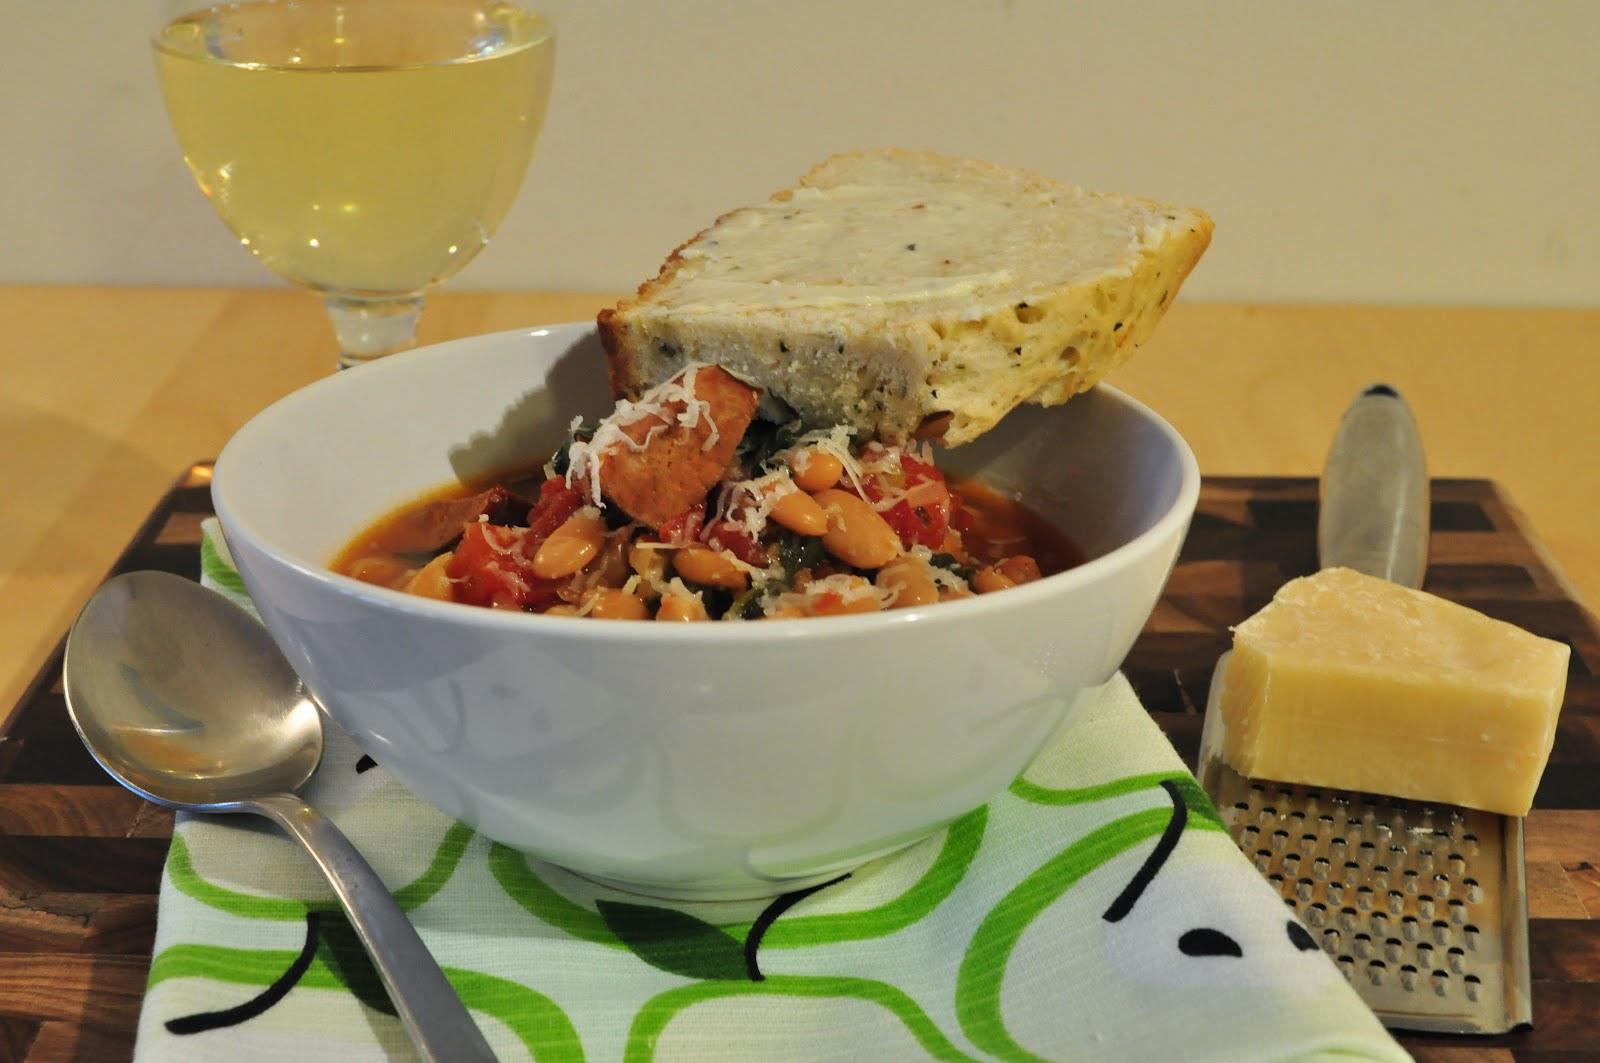 My Tiny Oven: Slow Cooker White Bean Stew with Kielbasa ...